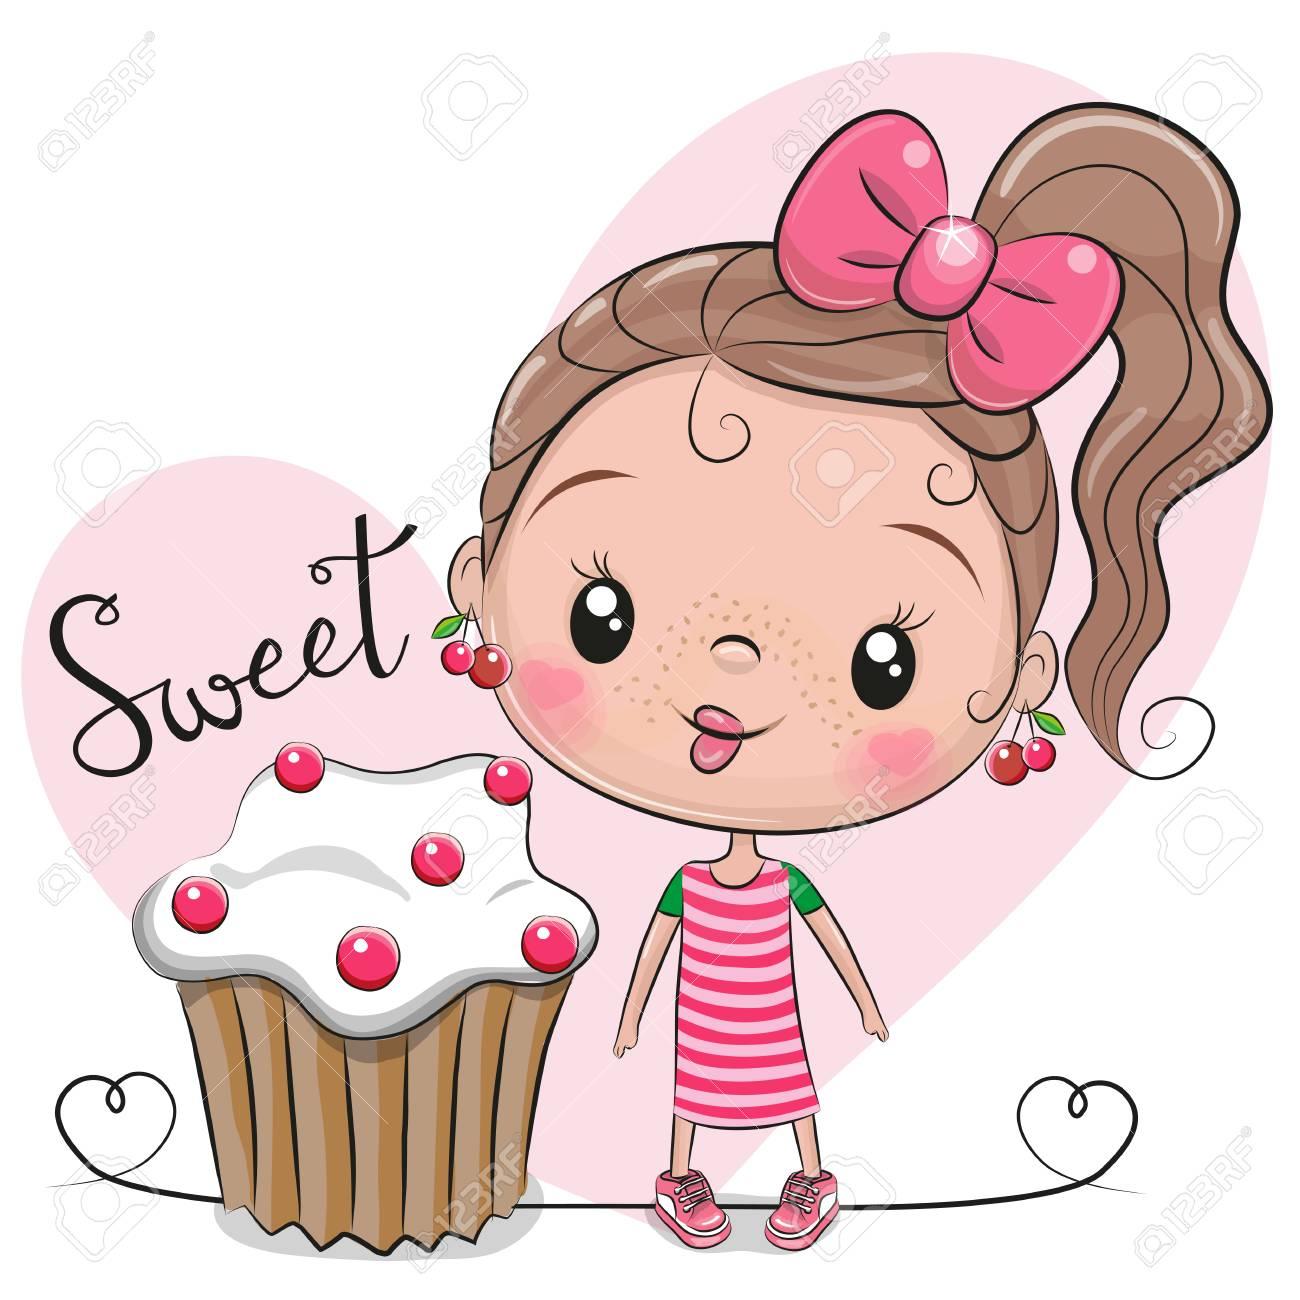 Greeting card Cute Cartoon Girl with cake - 112226774